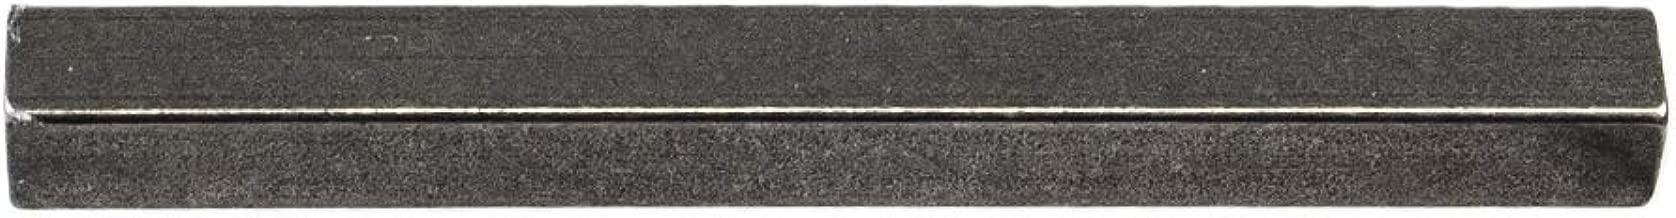 123583X 532123583 Square Key Craftsman Poulan Husqvarna For Rear Axle